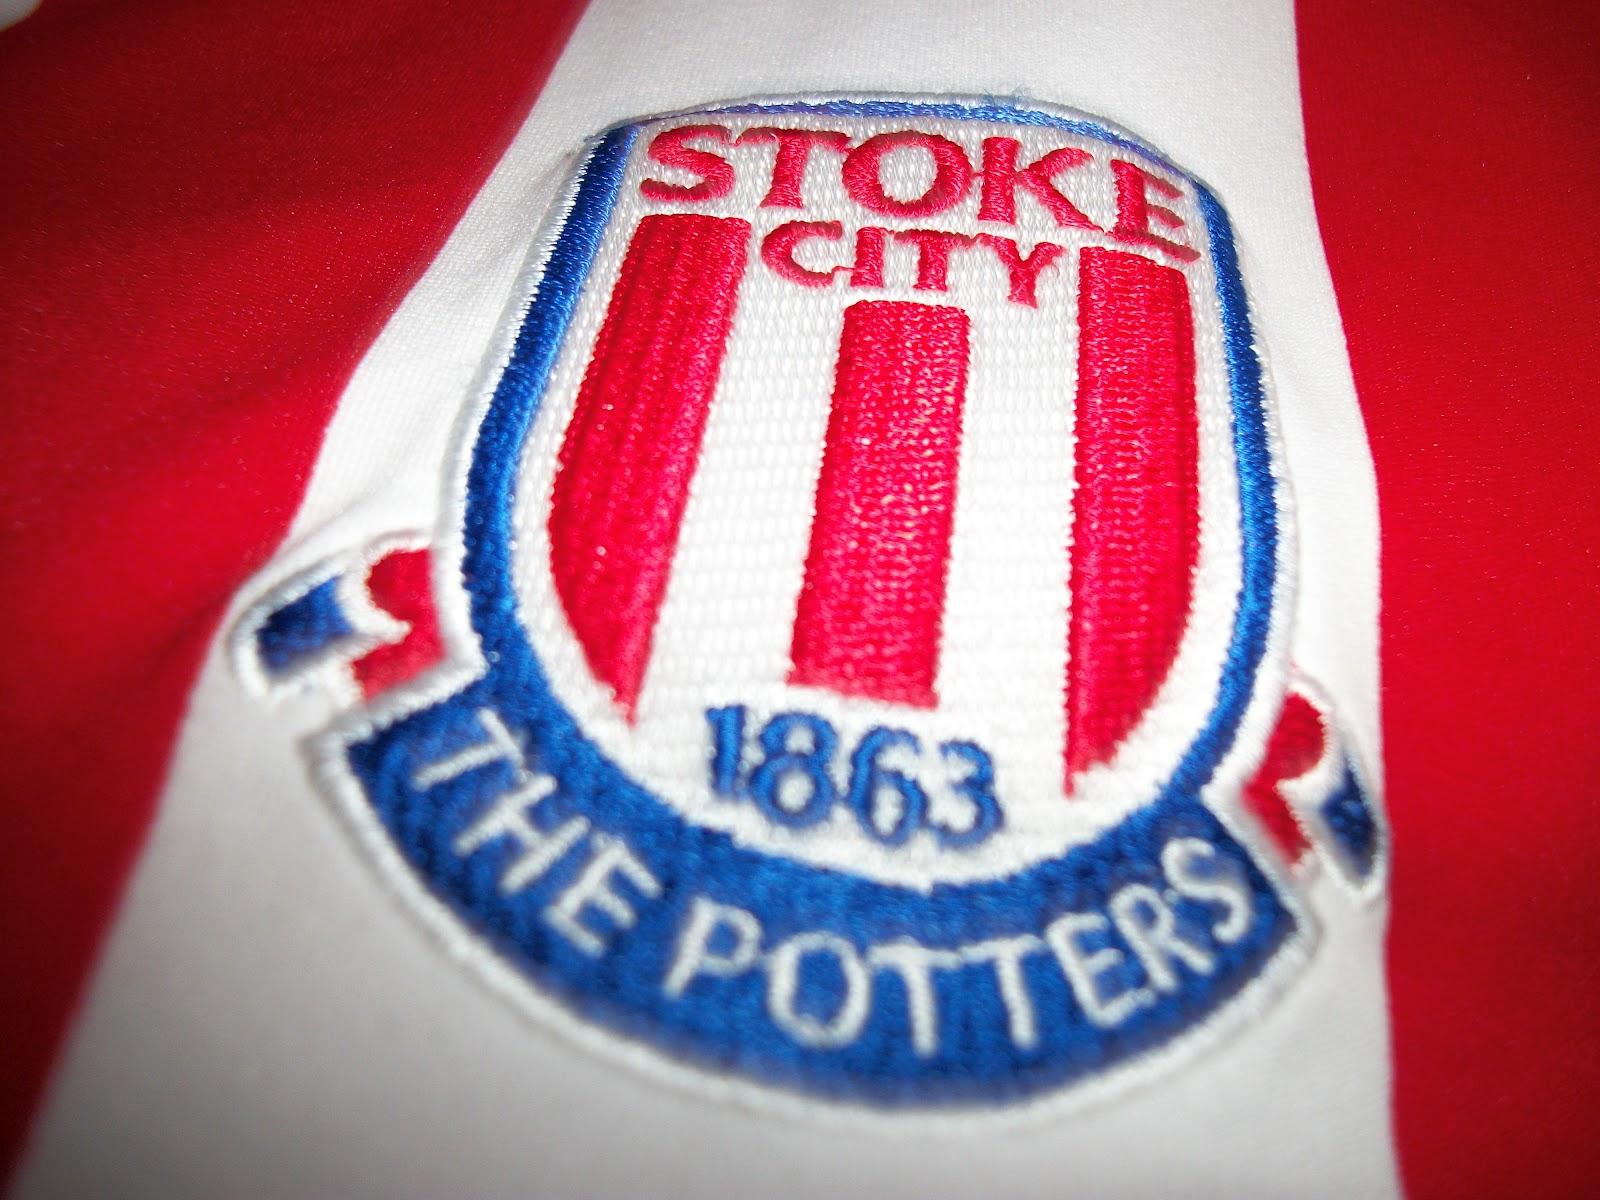 Stoke City FC Symbol Wallpaper